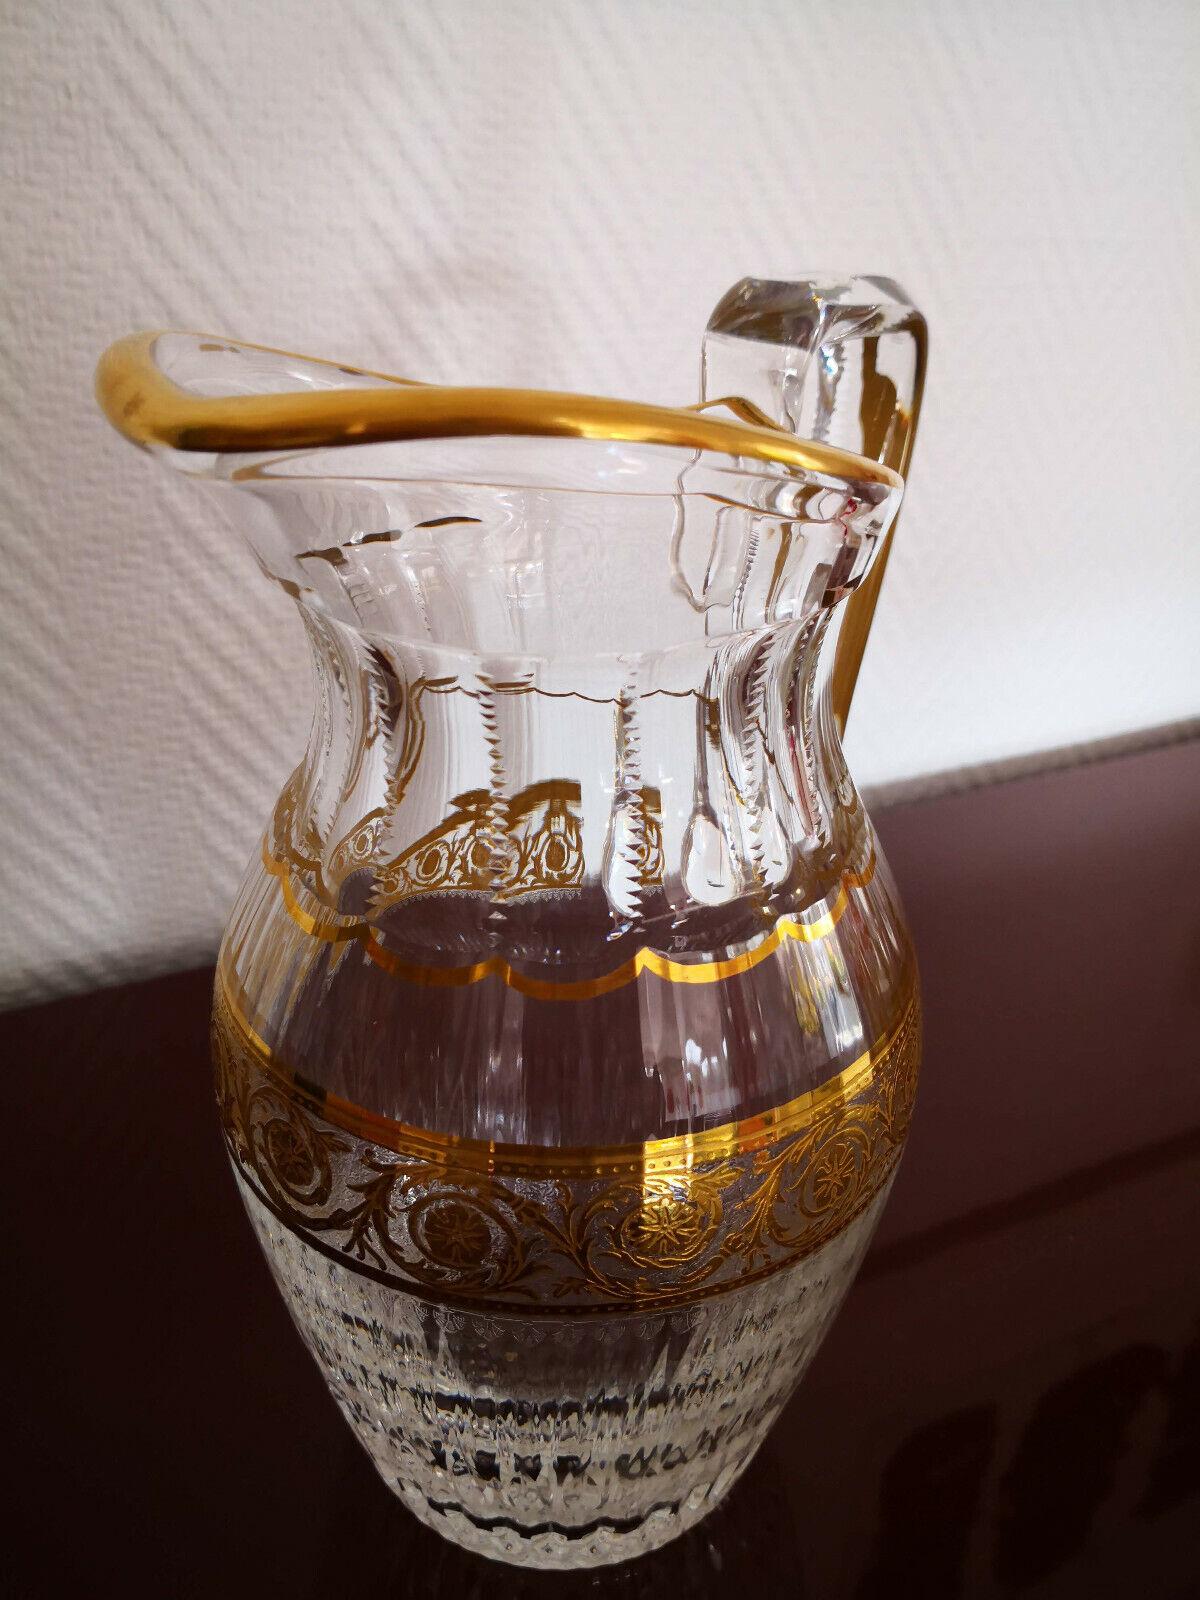 Cognacschwenker Cognac glas Louis Thistle 4 Gläser im Angebot Saint St